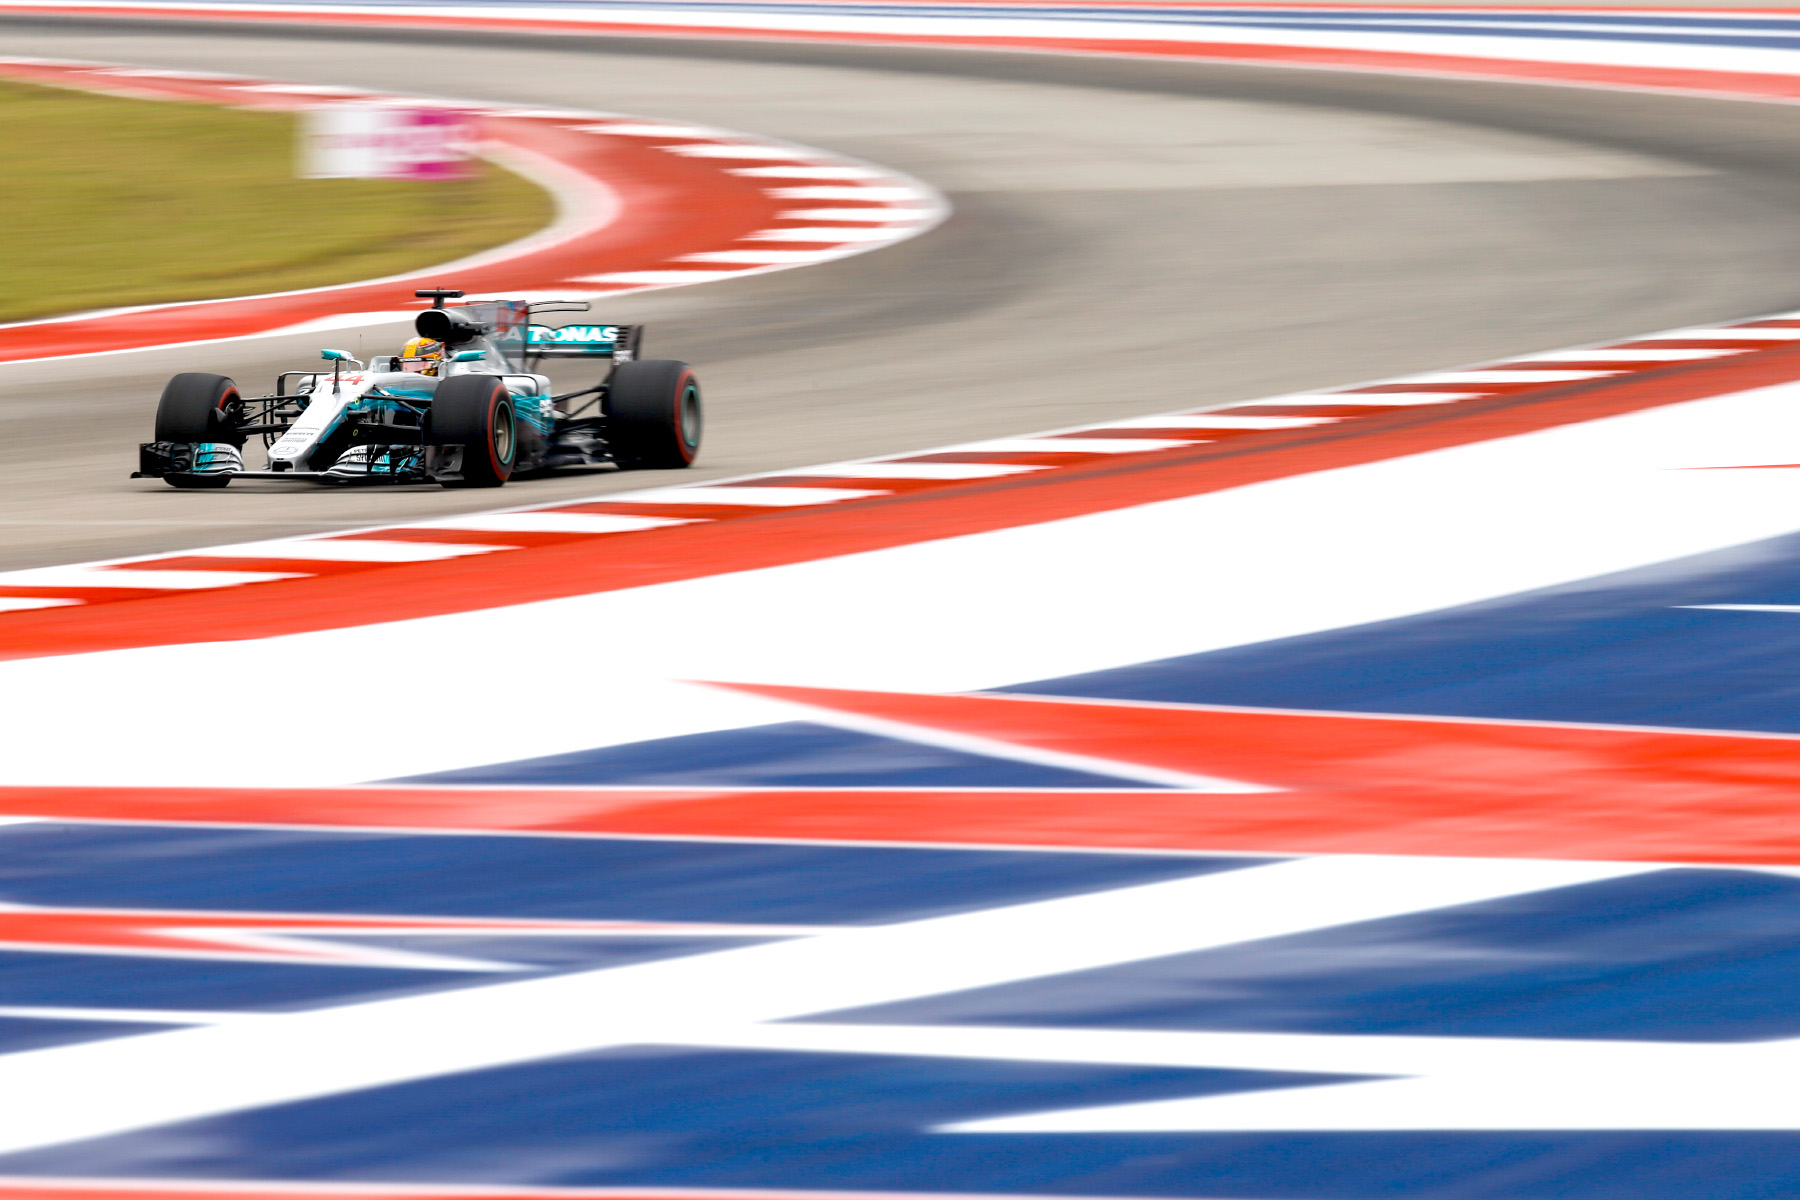 Lewis Hamilton on track at the 2017 United States Grand Prix